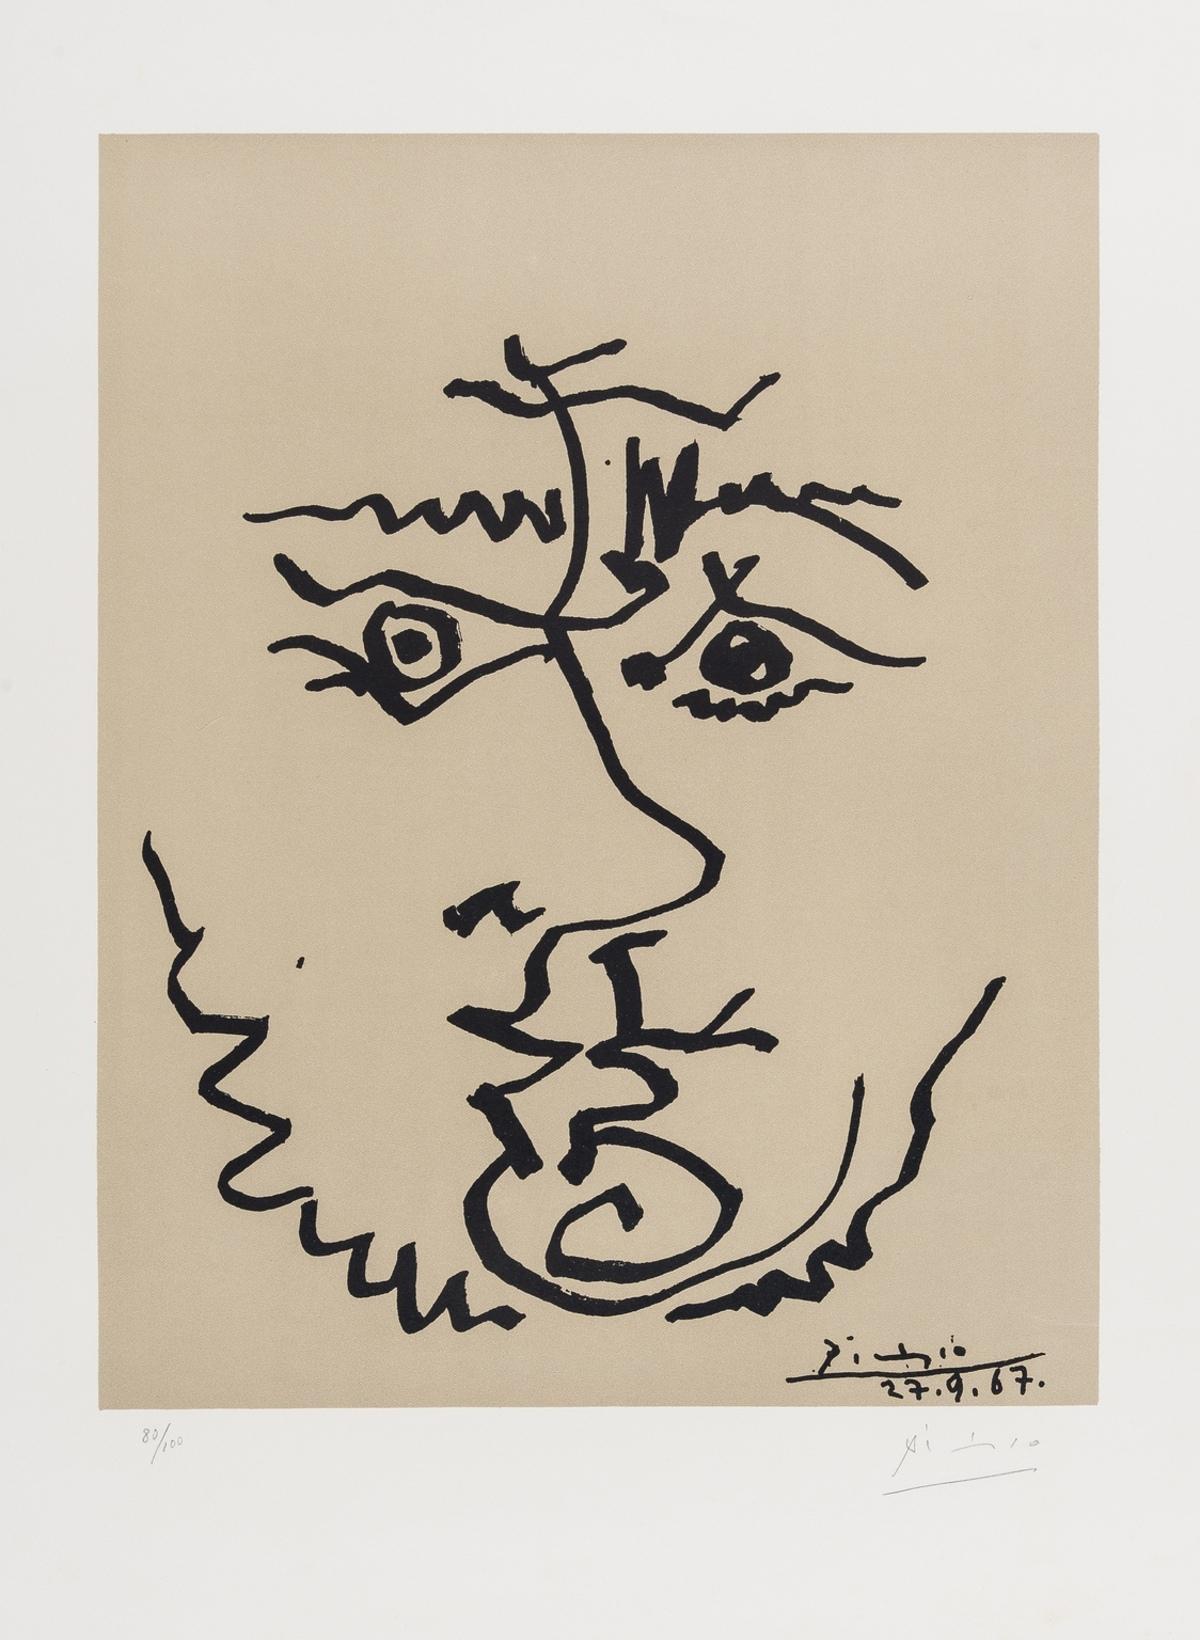 Pablo Picasso (1881-1973) (after) Visage